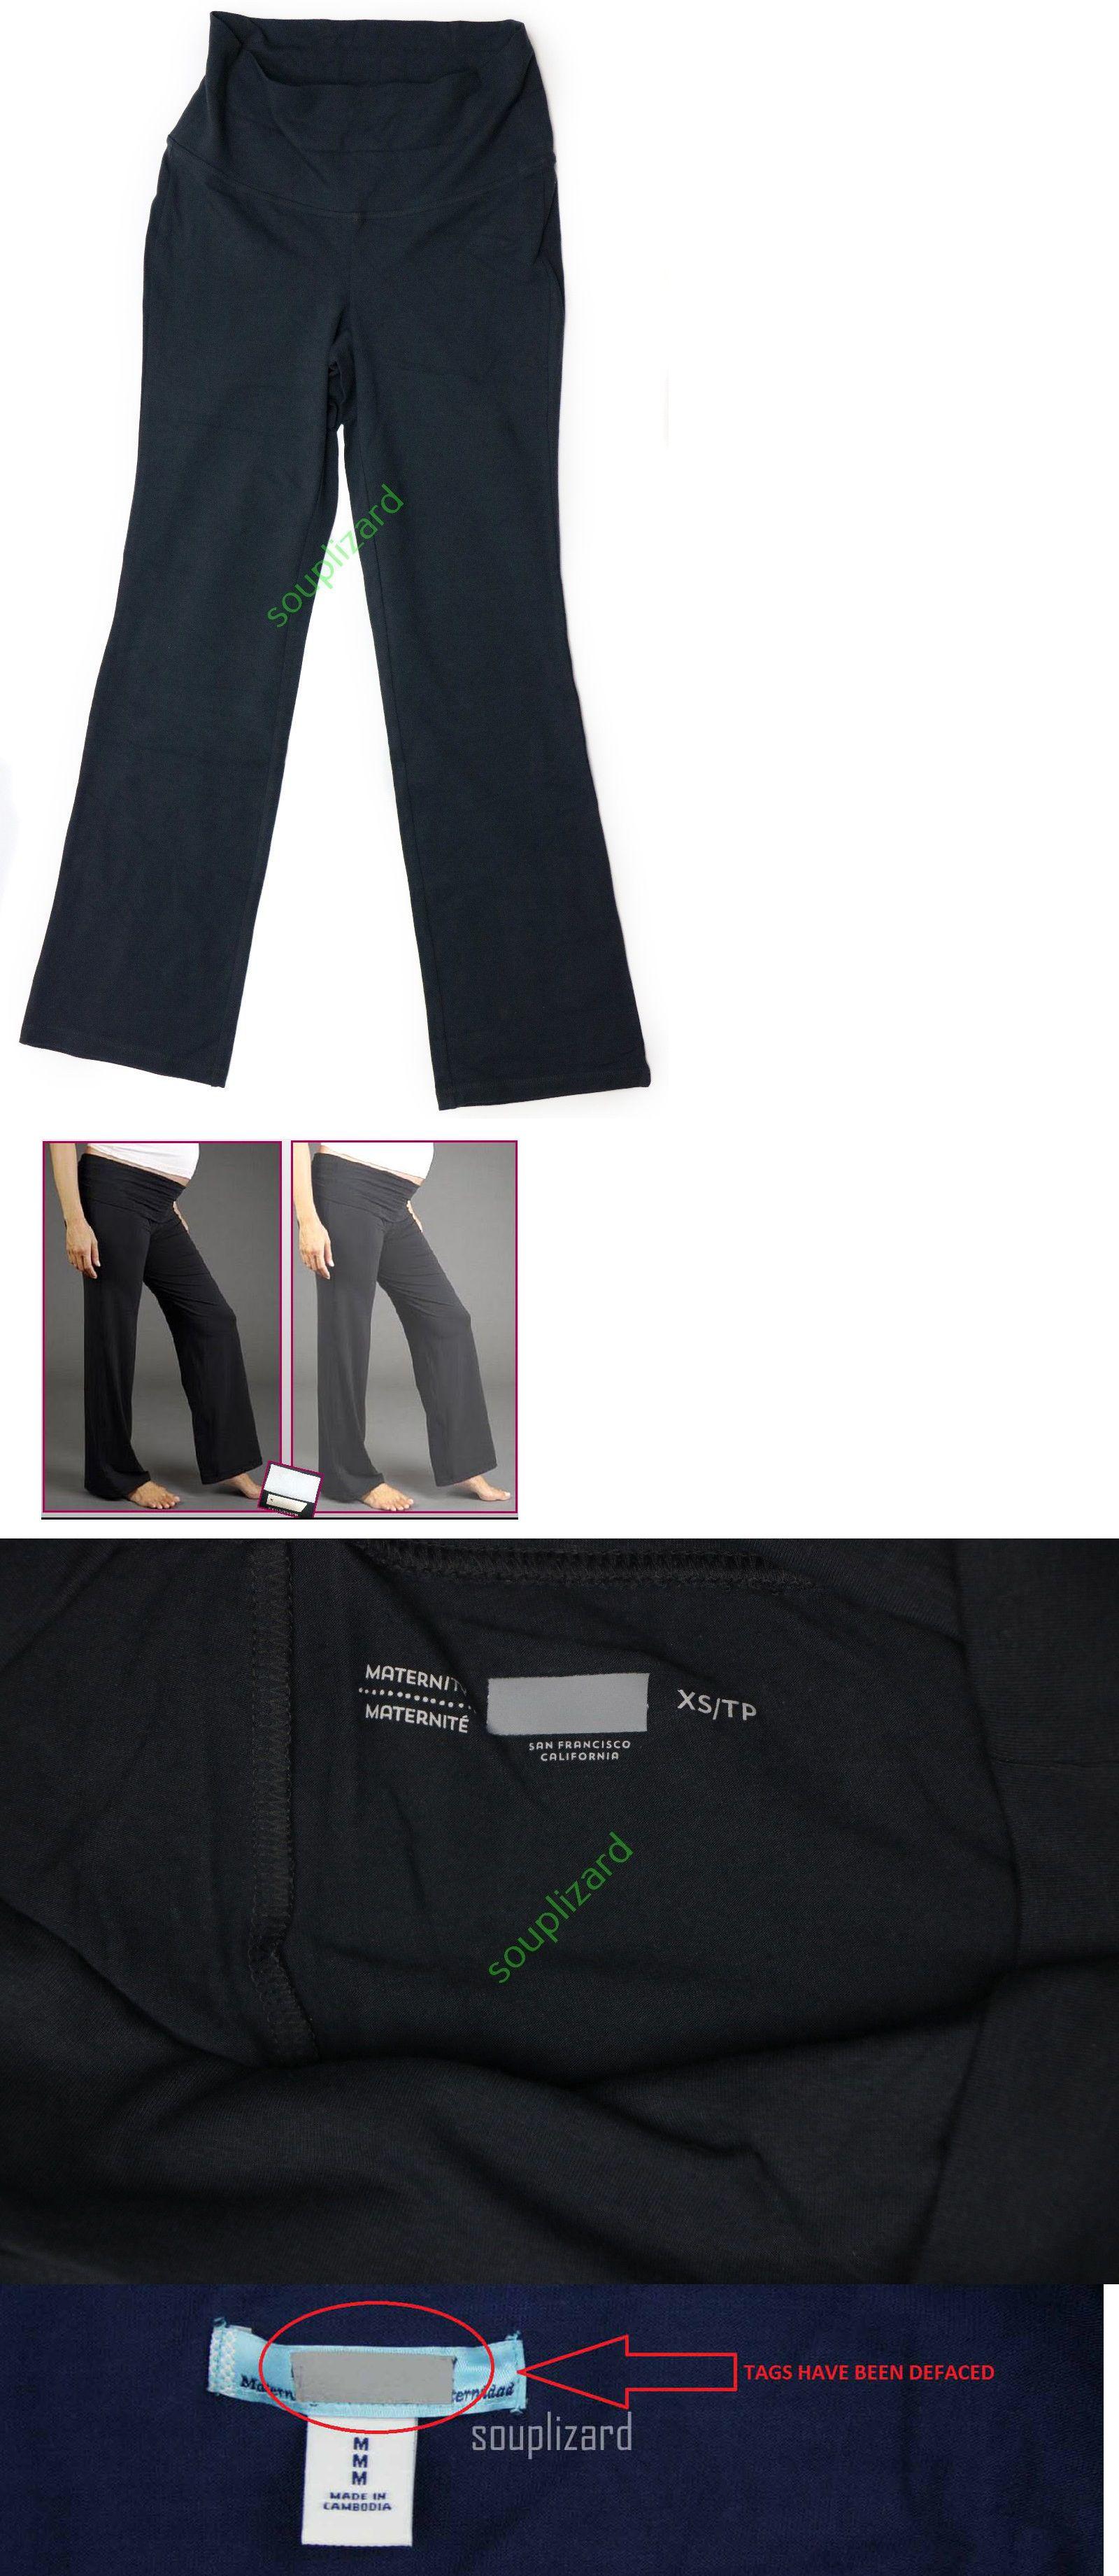 318603c45e61 Pants 63857: New Old Navy Maternity Fold Over Gray Yoga Pants Women S Nwot  Size Xs S M L Xl -> BUY IT NOW ONLY: $18.1 on #eBay #pants #maternity #women